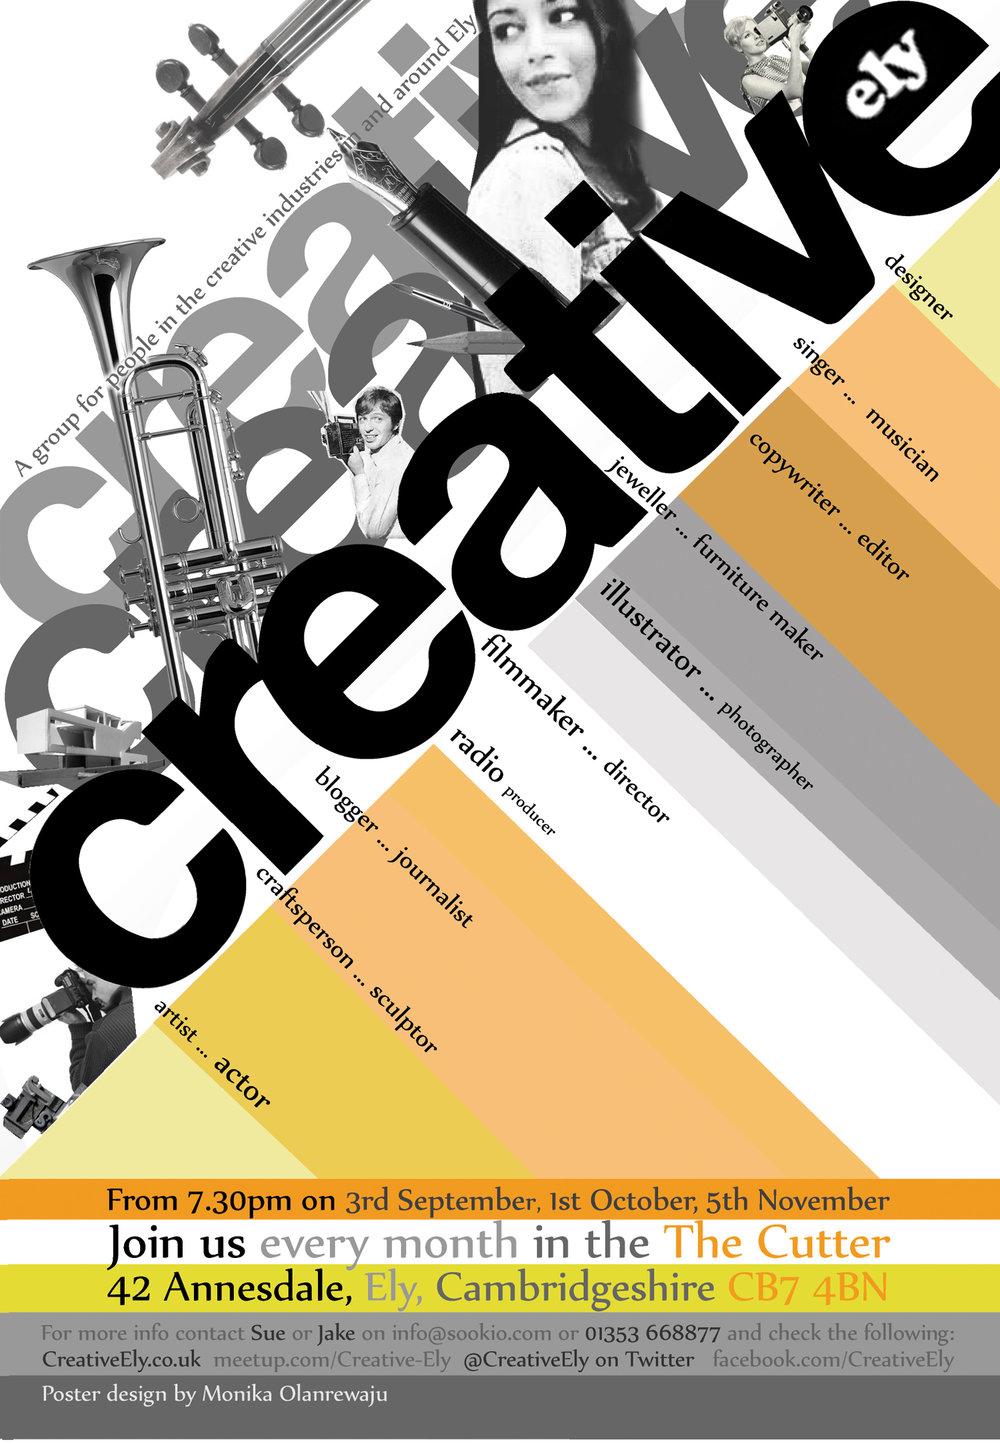 Poster design by Monika Olanrewaju